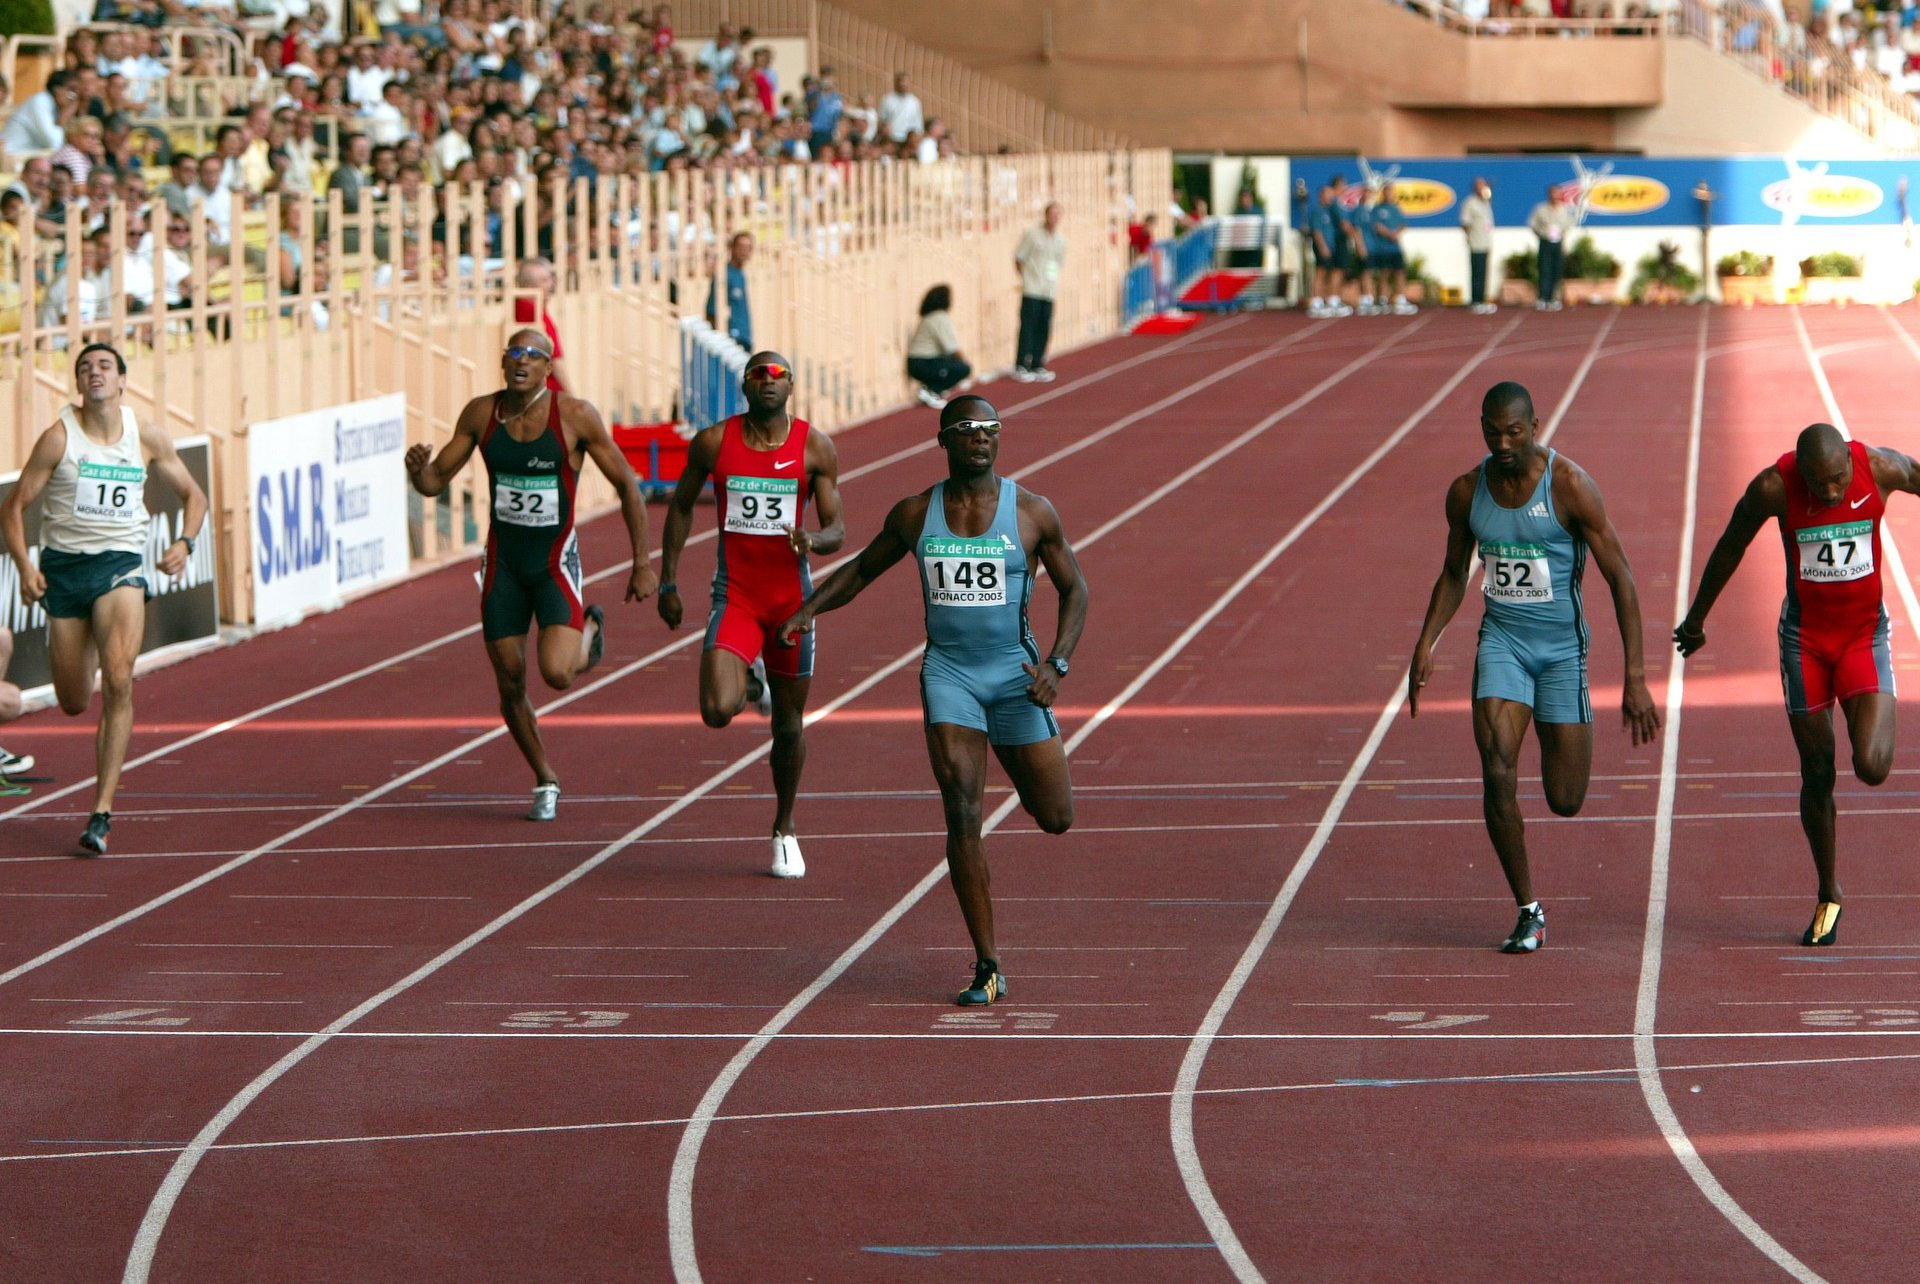 Monaco Run in Monaco - Best Season 2020